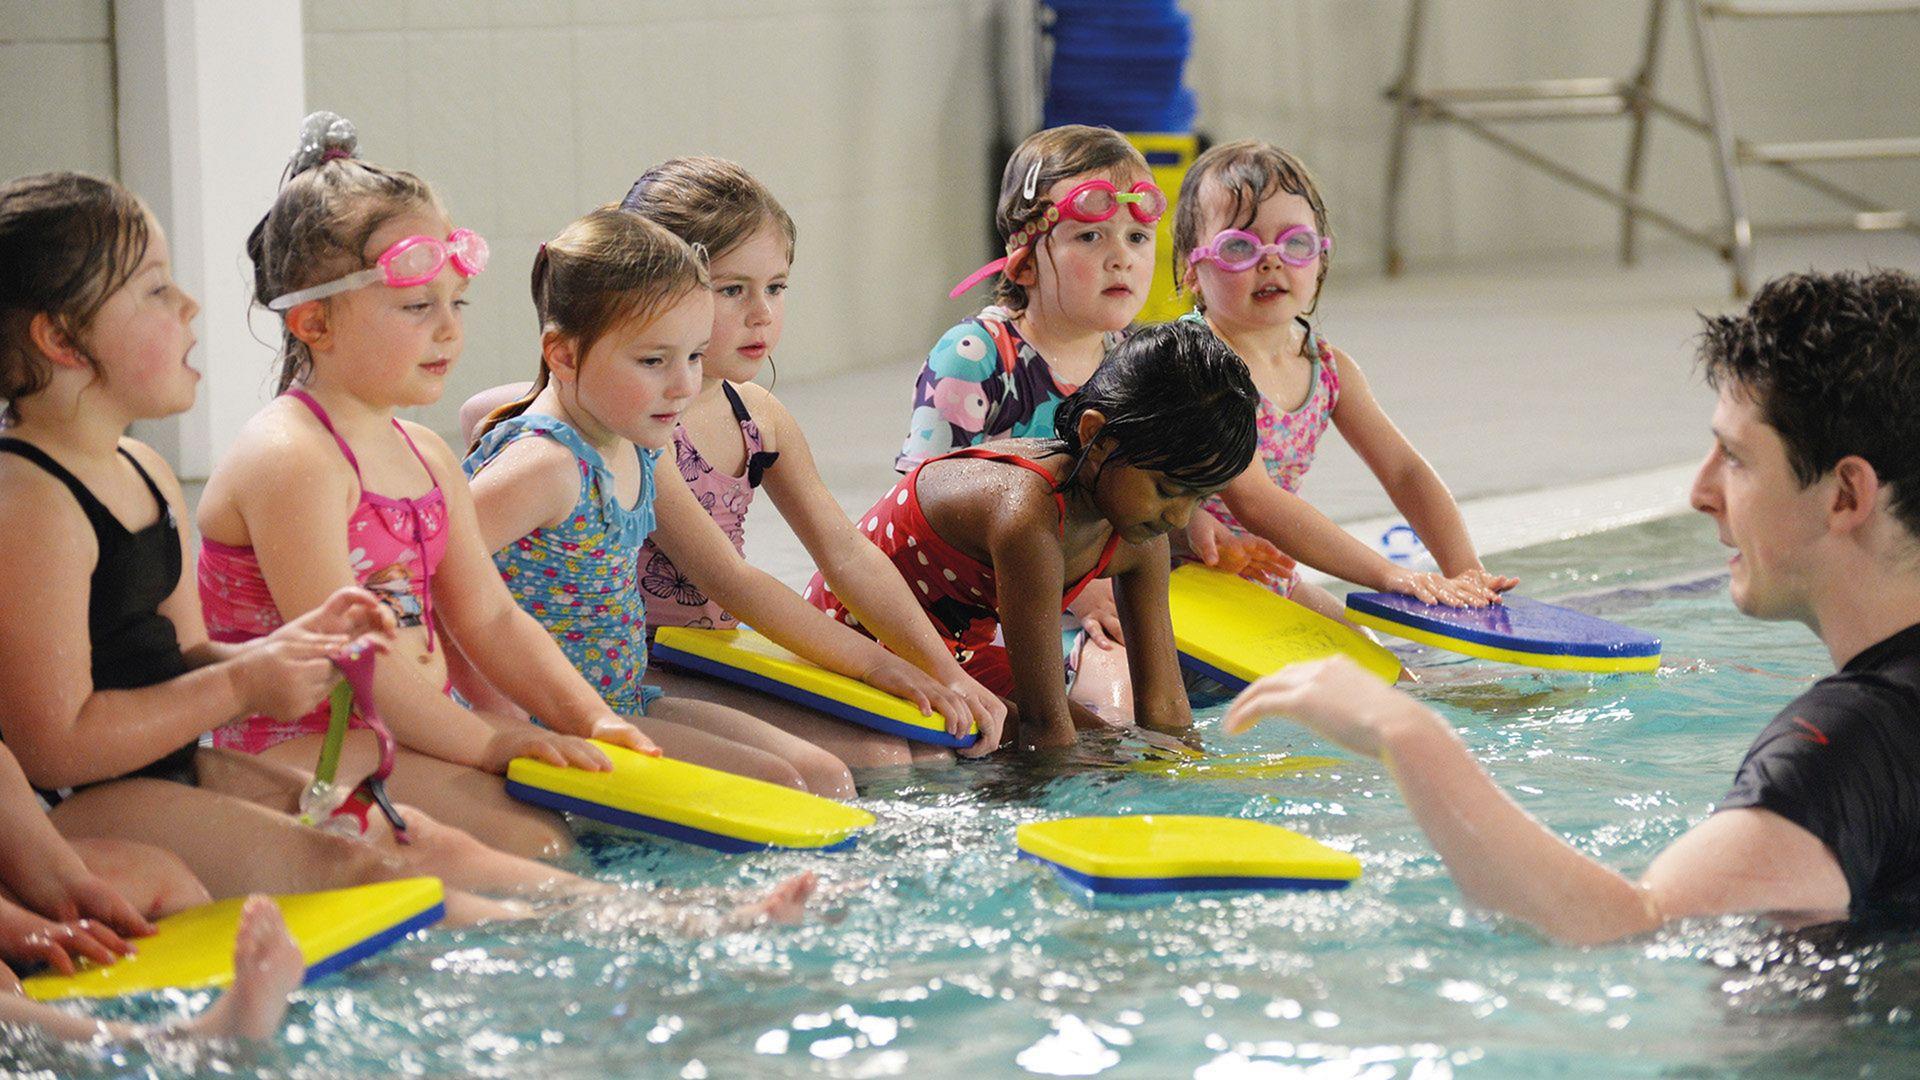 Kids Swimming Pool Ideas